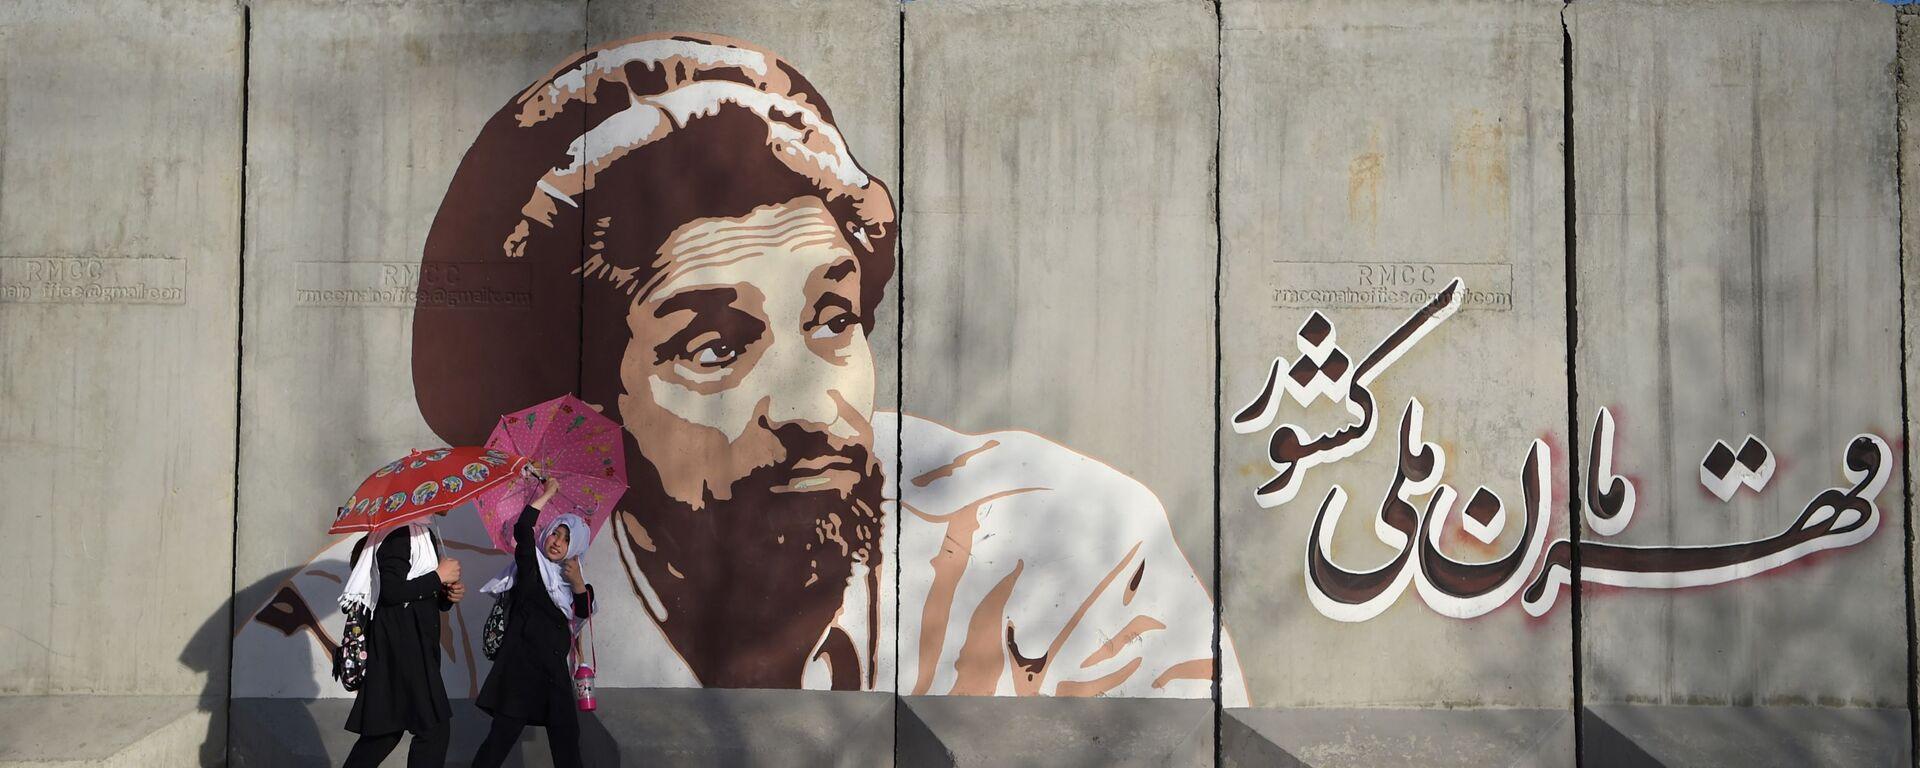 Школьницы идут по улице Кабула на фоне граффити с изображением Ахмада Шах Масуда - Sputnik Таджикистан, 1920, 09.09.2020